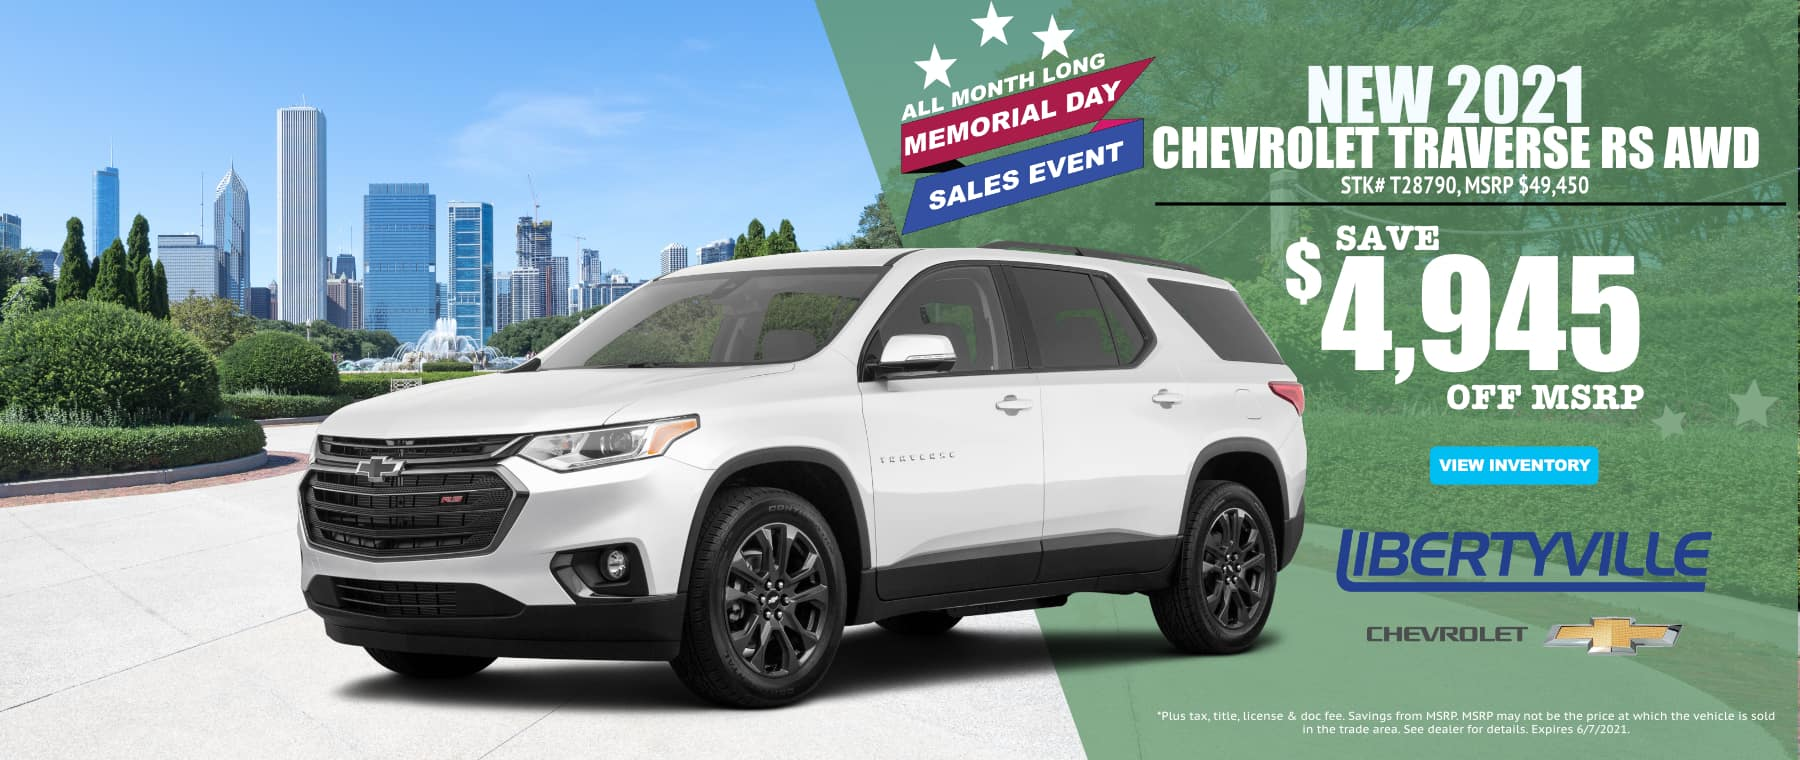 May_2021_Traverse_Chevrolet